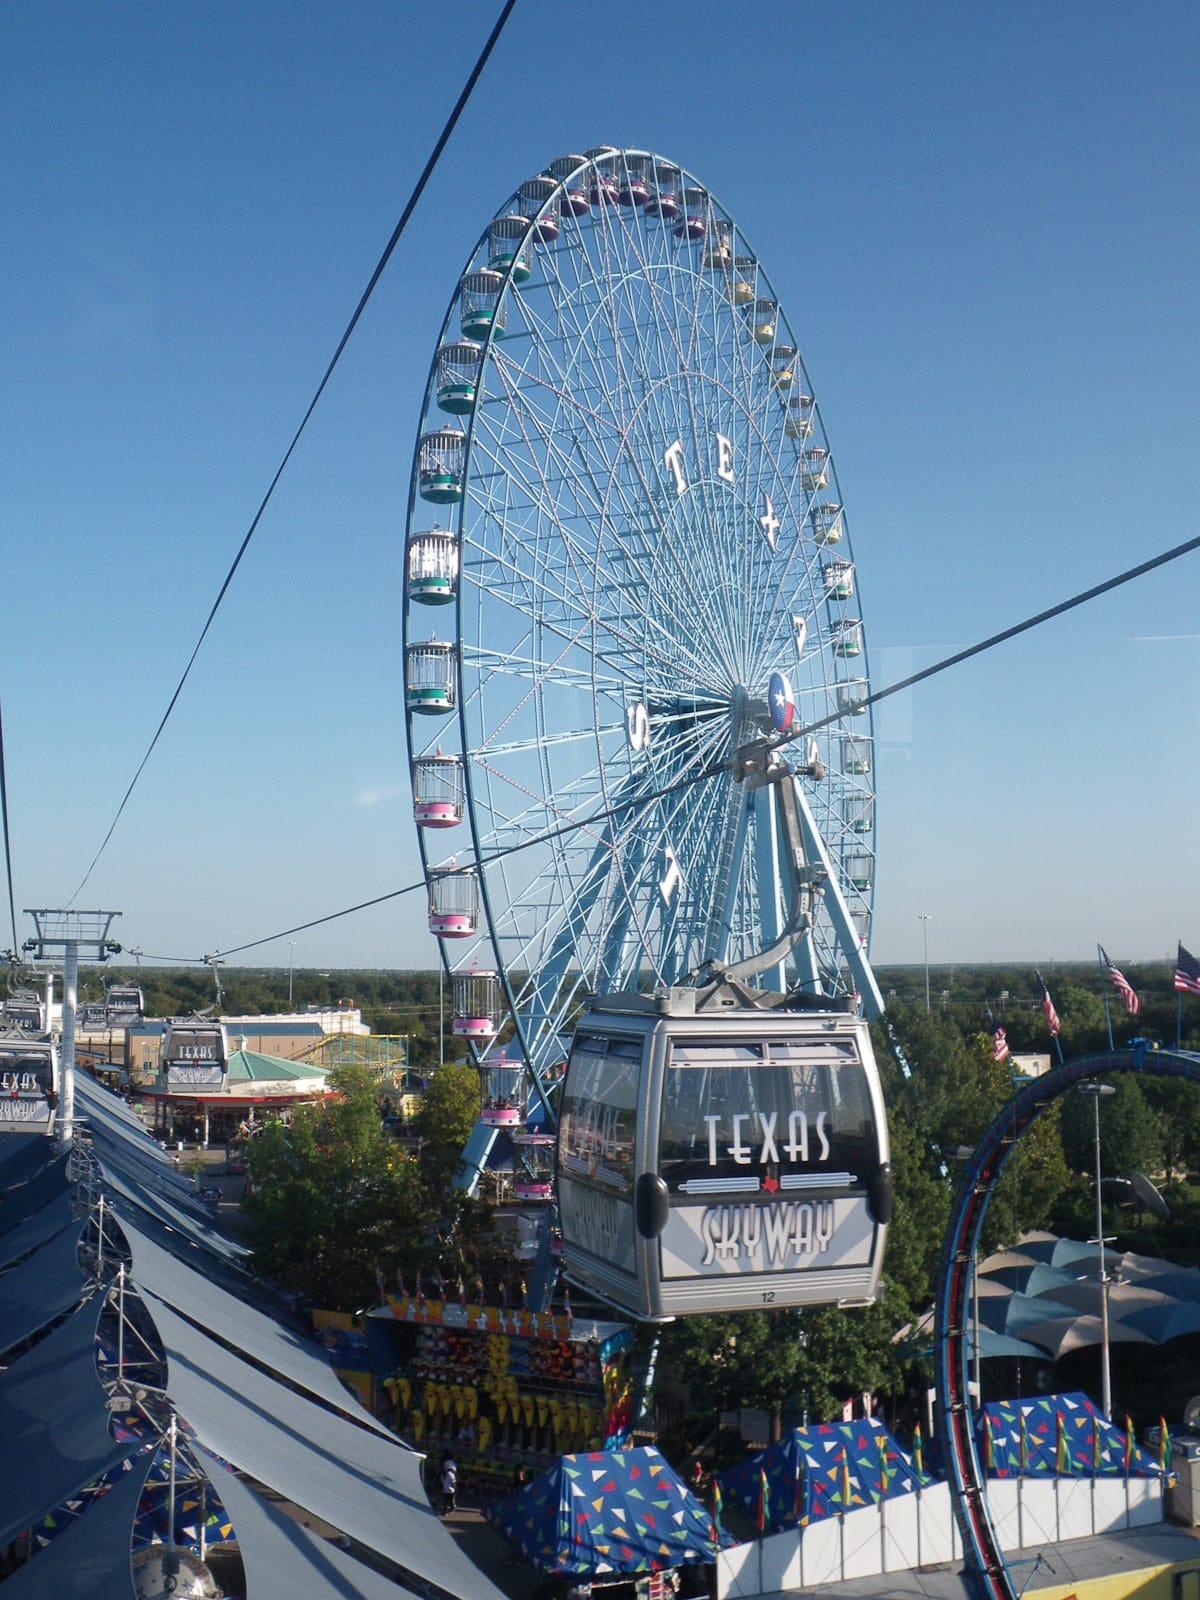 News_State Fair of Texas_Ferris Wheel_Texas Skyway